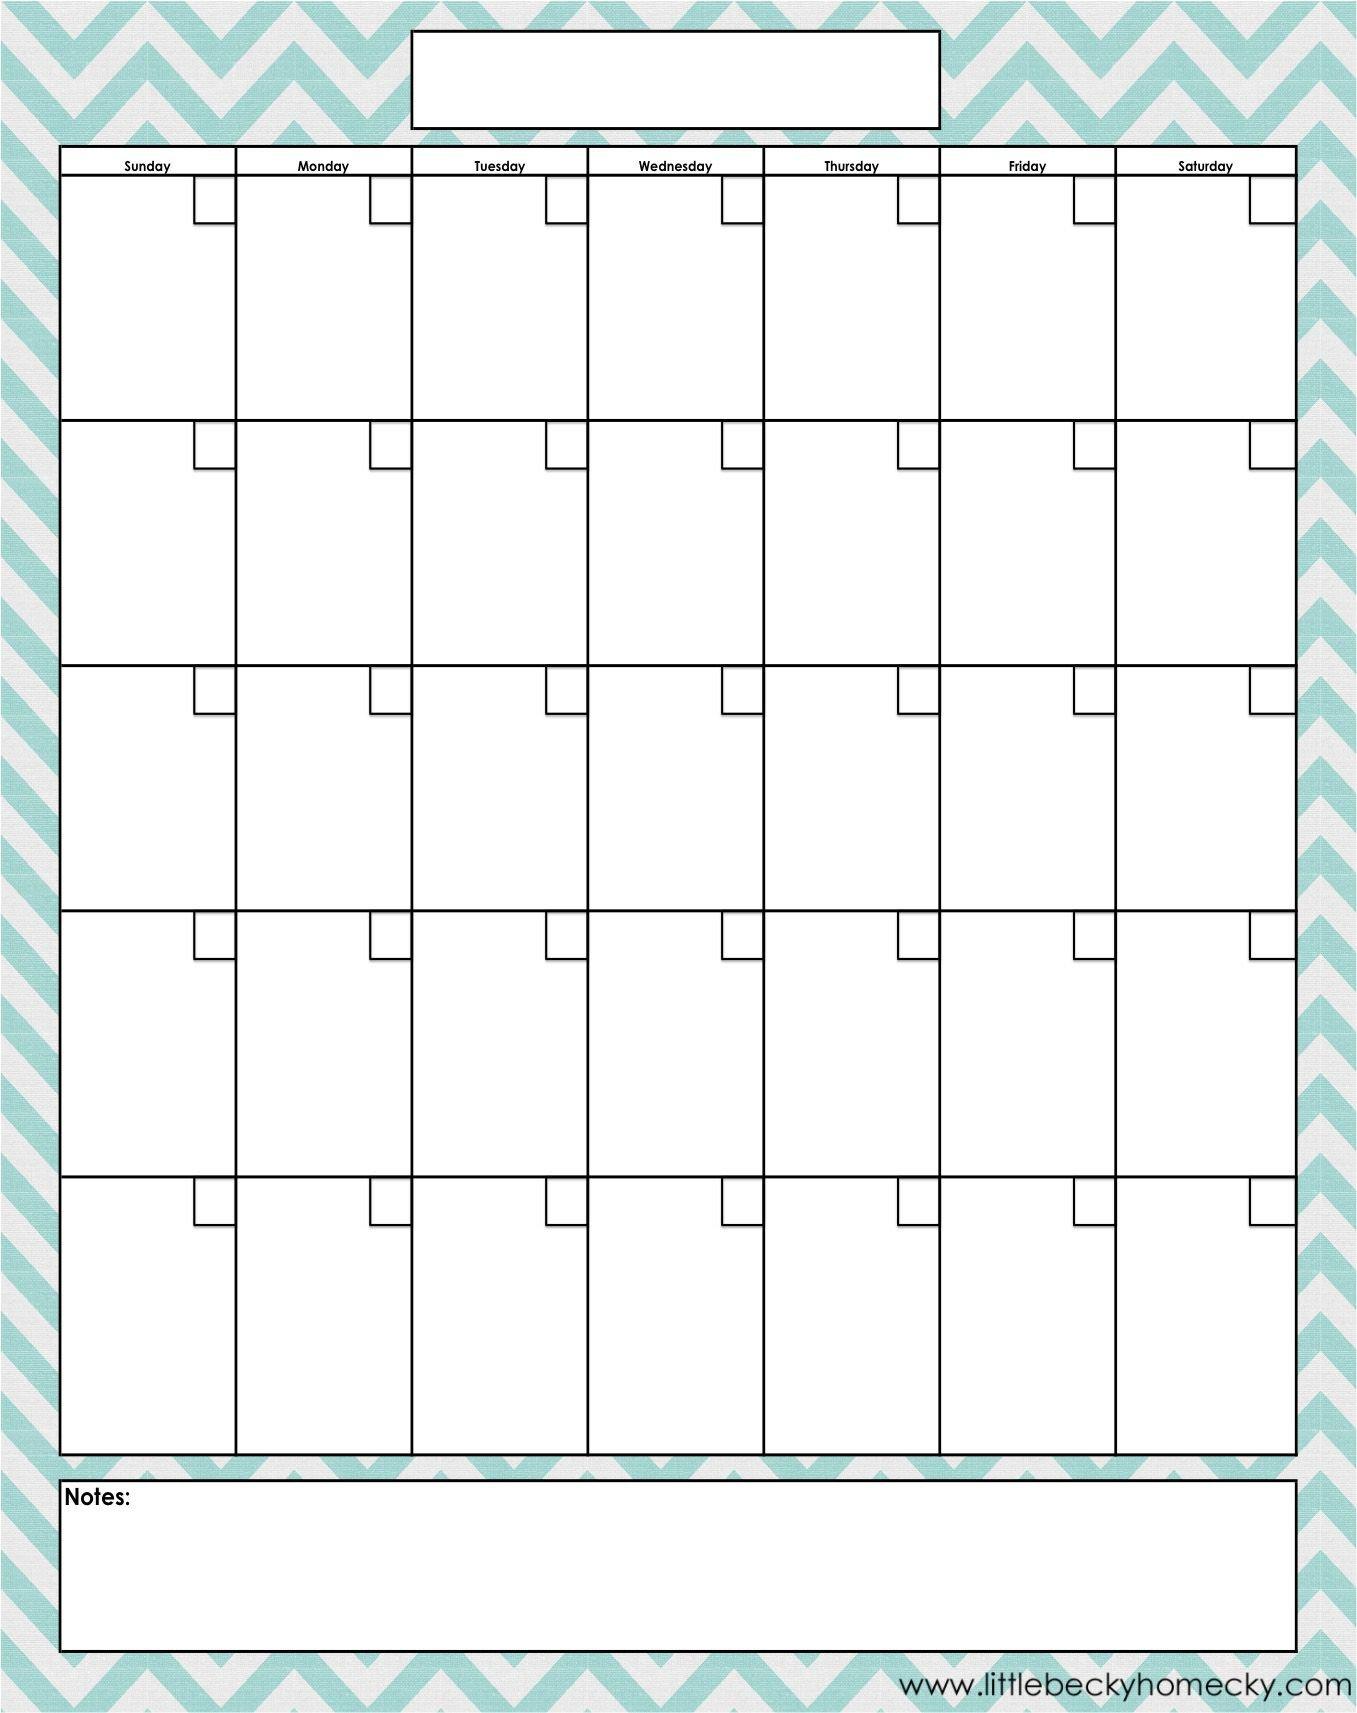 Blank Fill In Calendar | Calendar Template Printable How To Fill In Calendar & Print